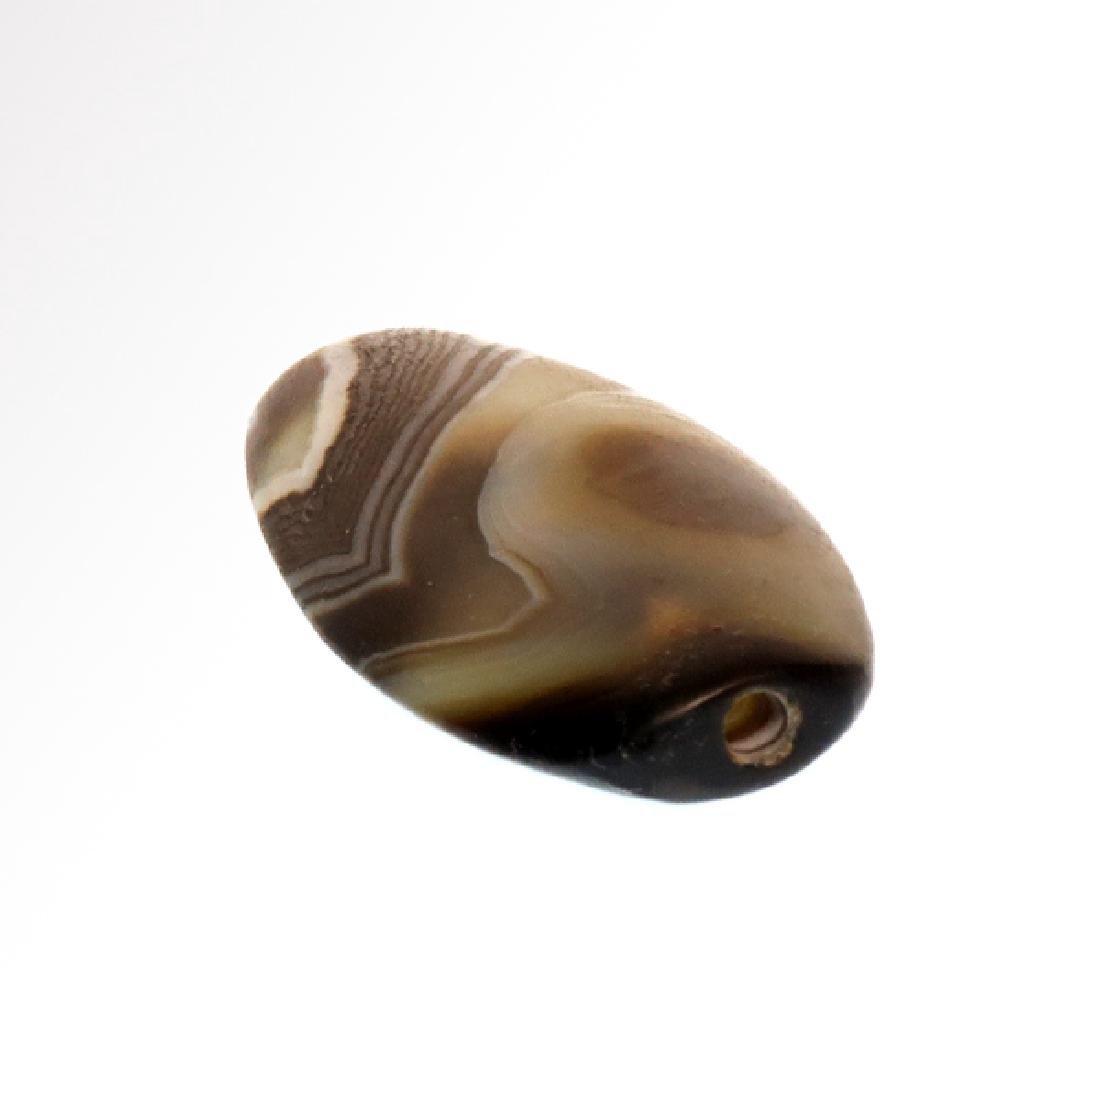 Banded Agate Bead, Near-East, c. 1st Millenium B.C. - 4